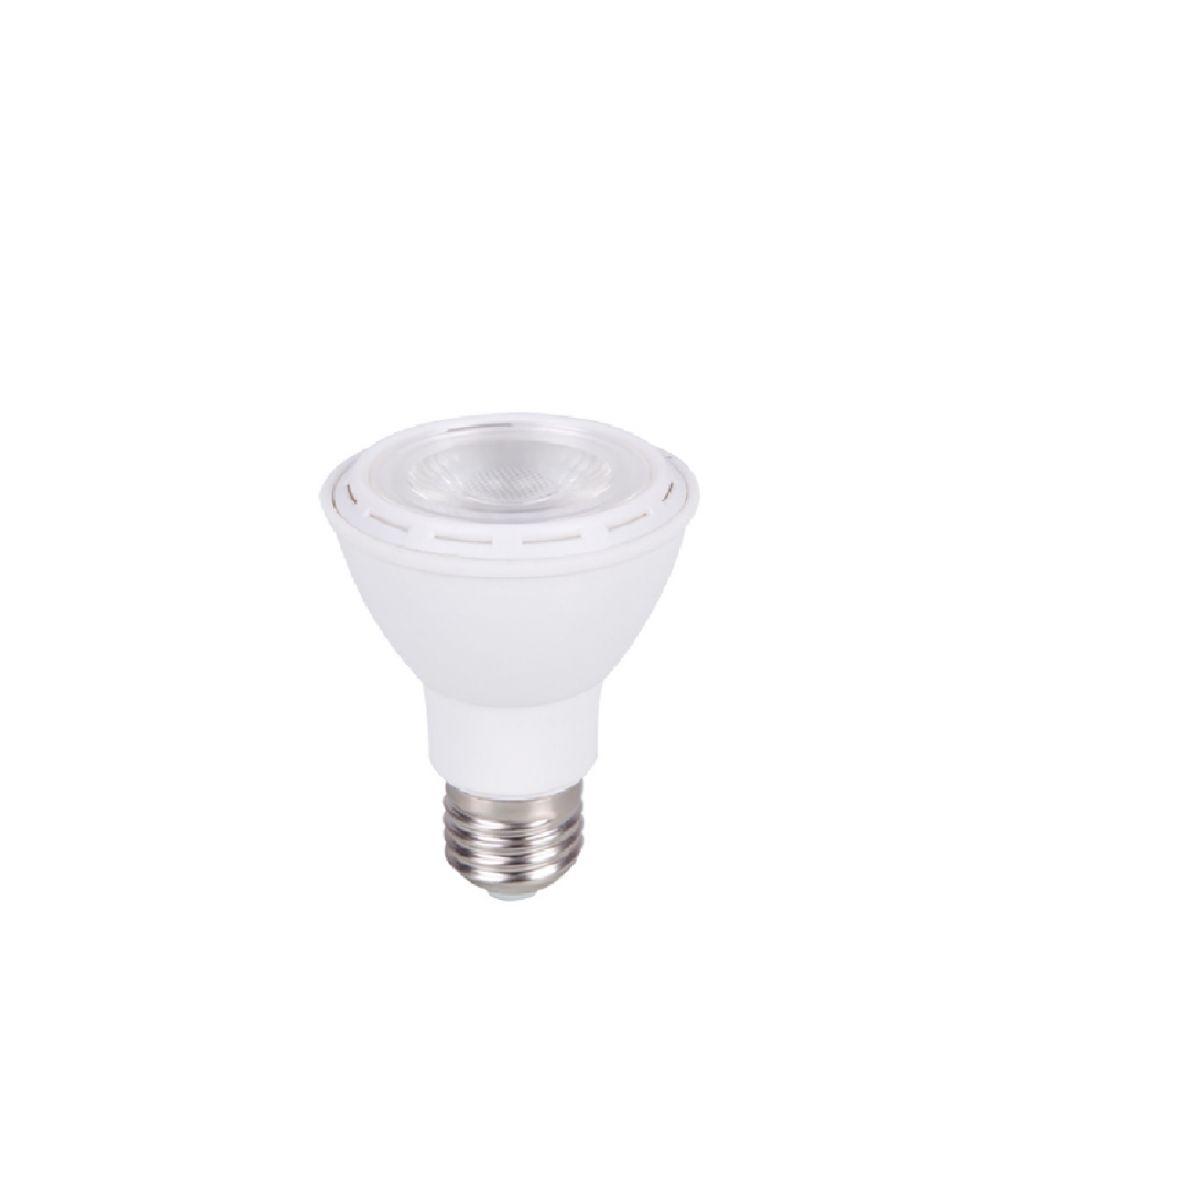 Lâmpada LED PAR 20 8W Biv Losch  - Giamar